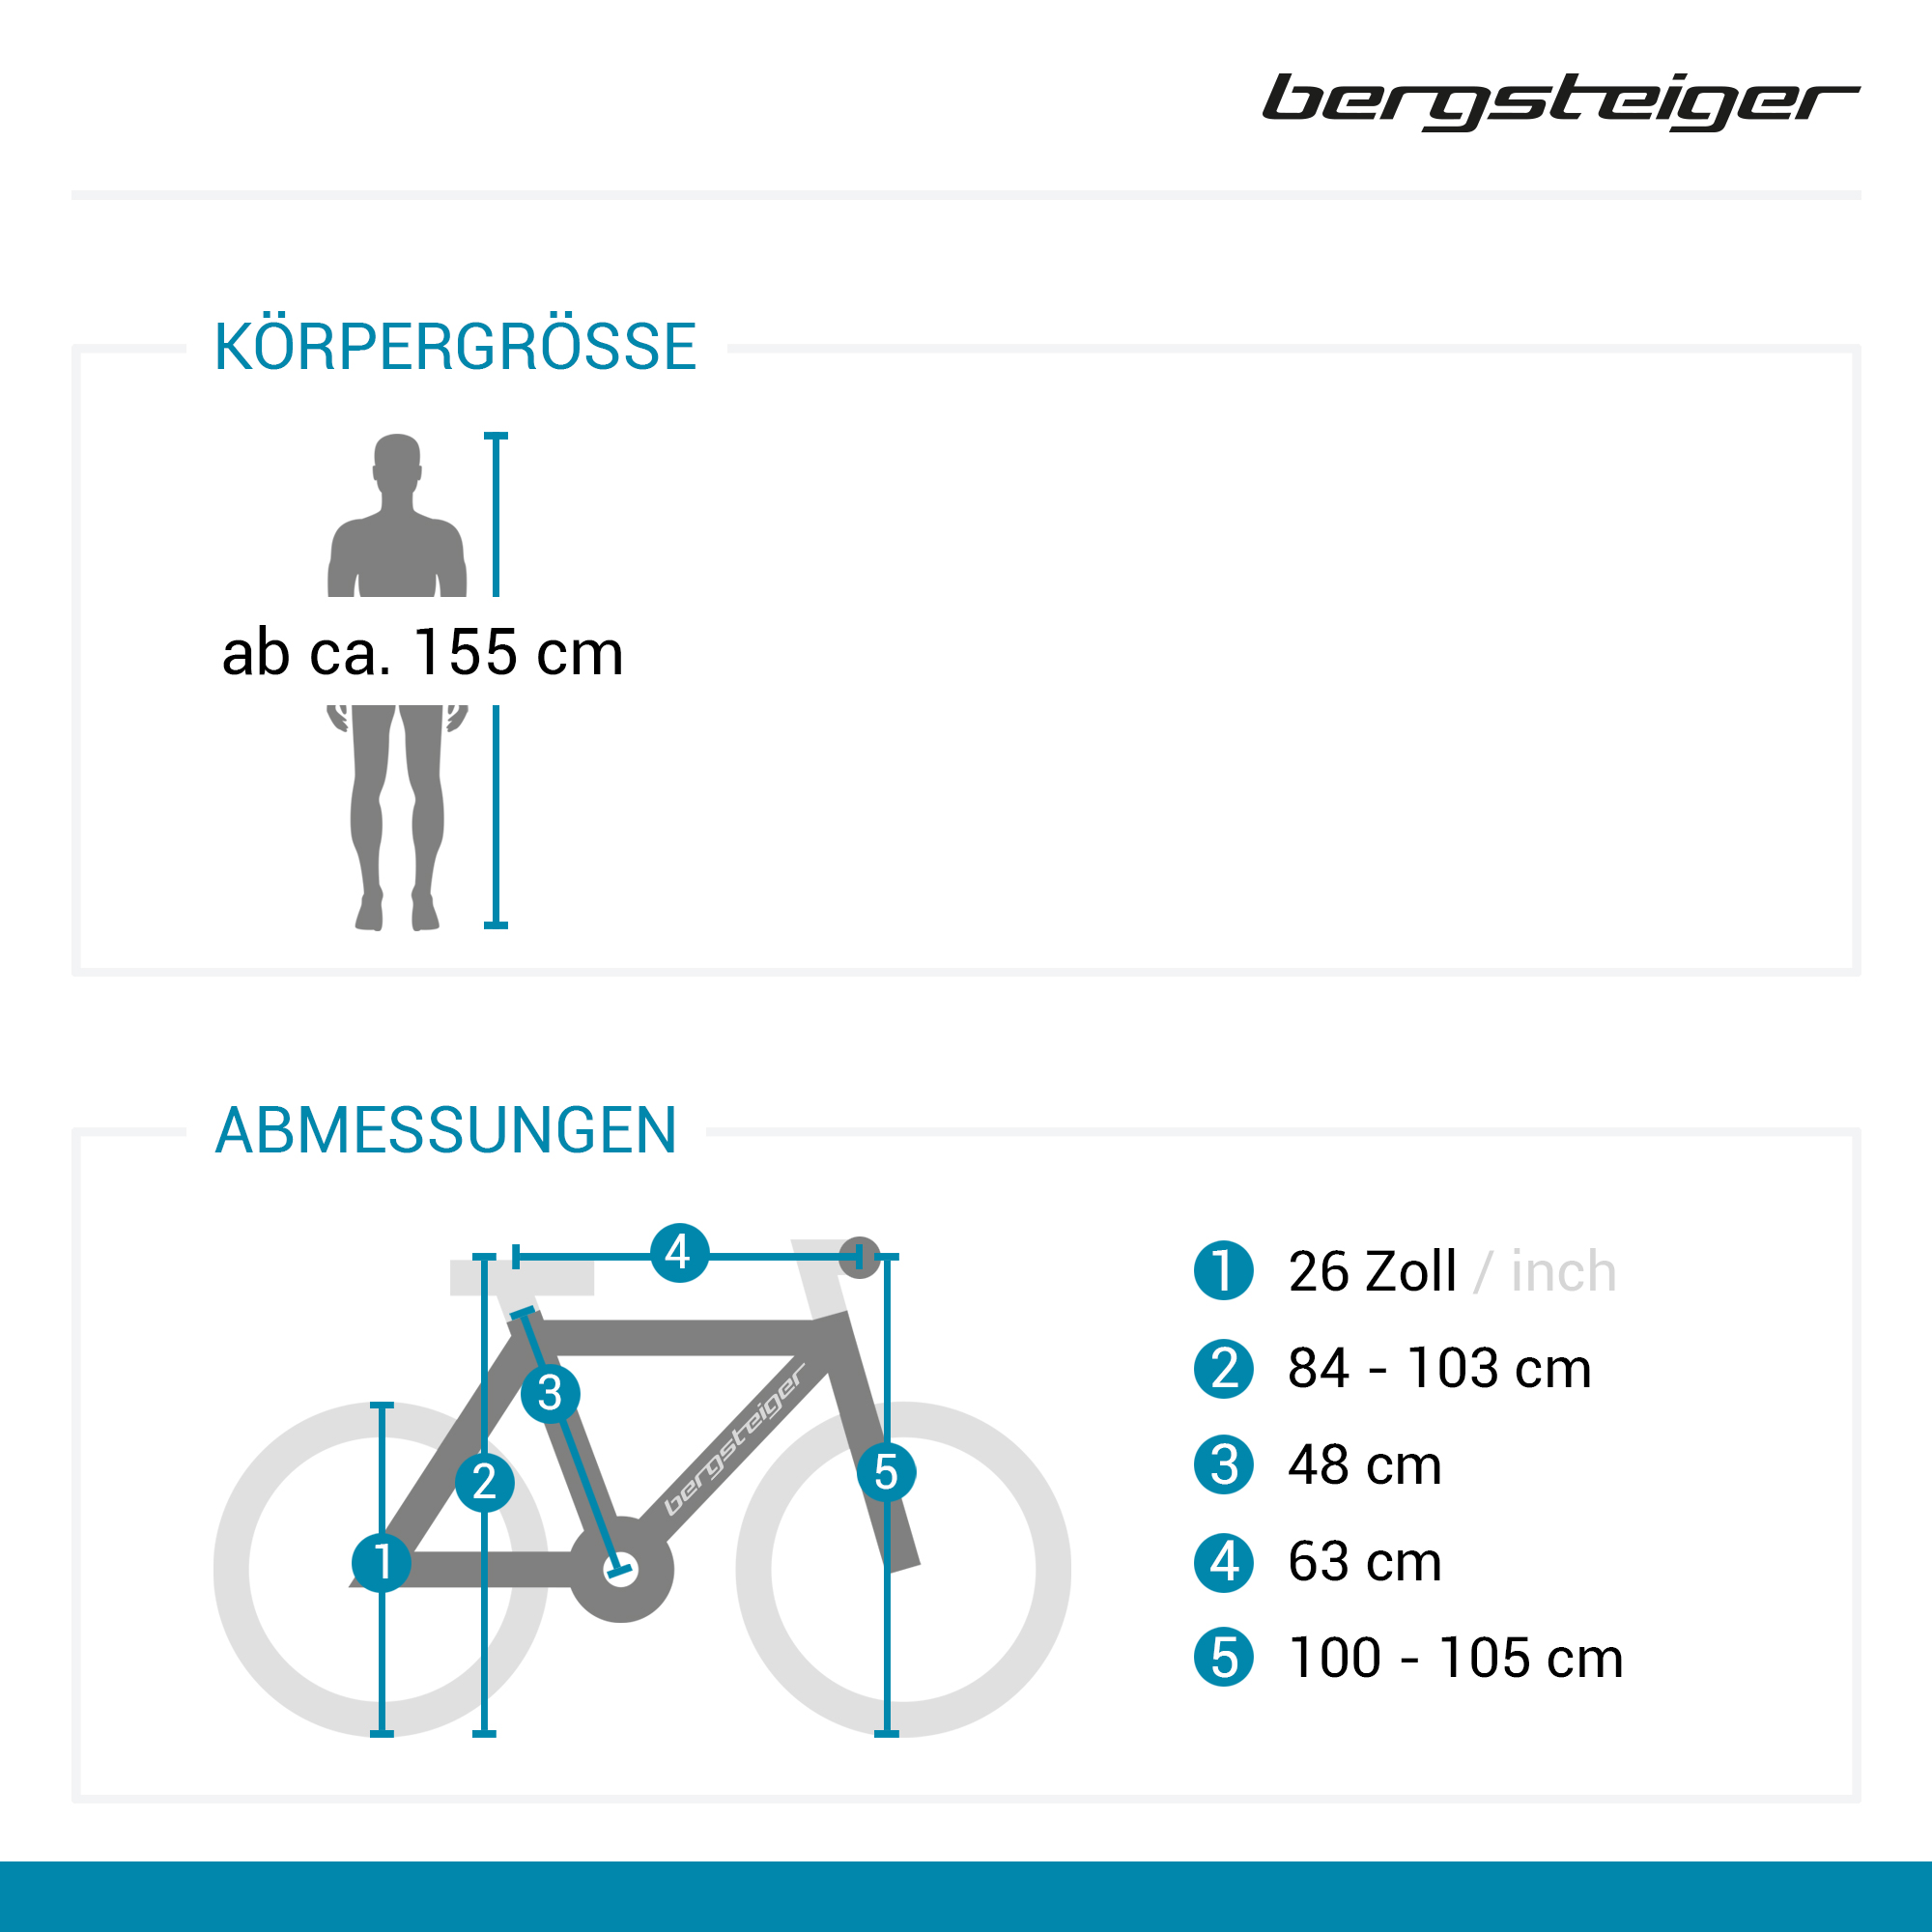 rahmenhöhe fahrrad körpergröße